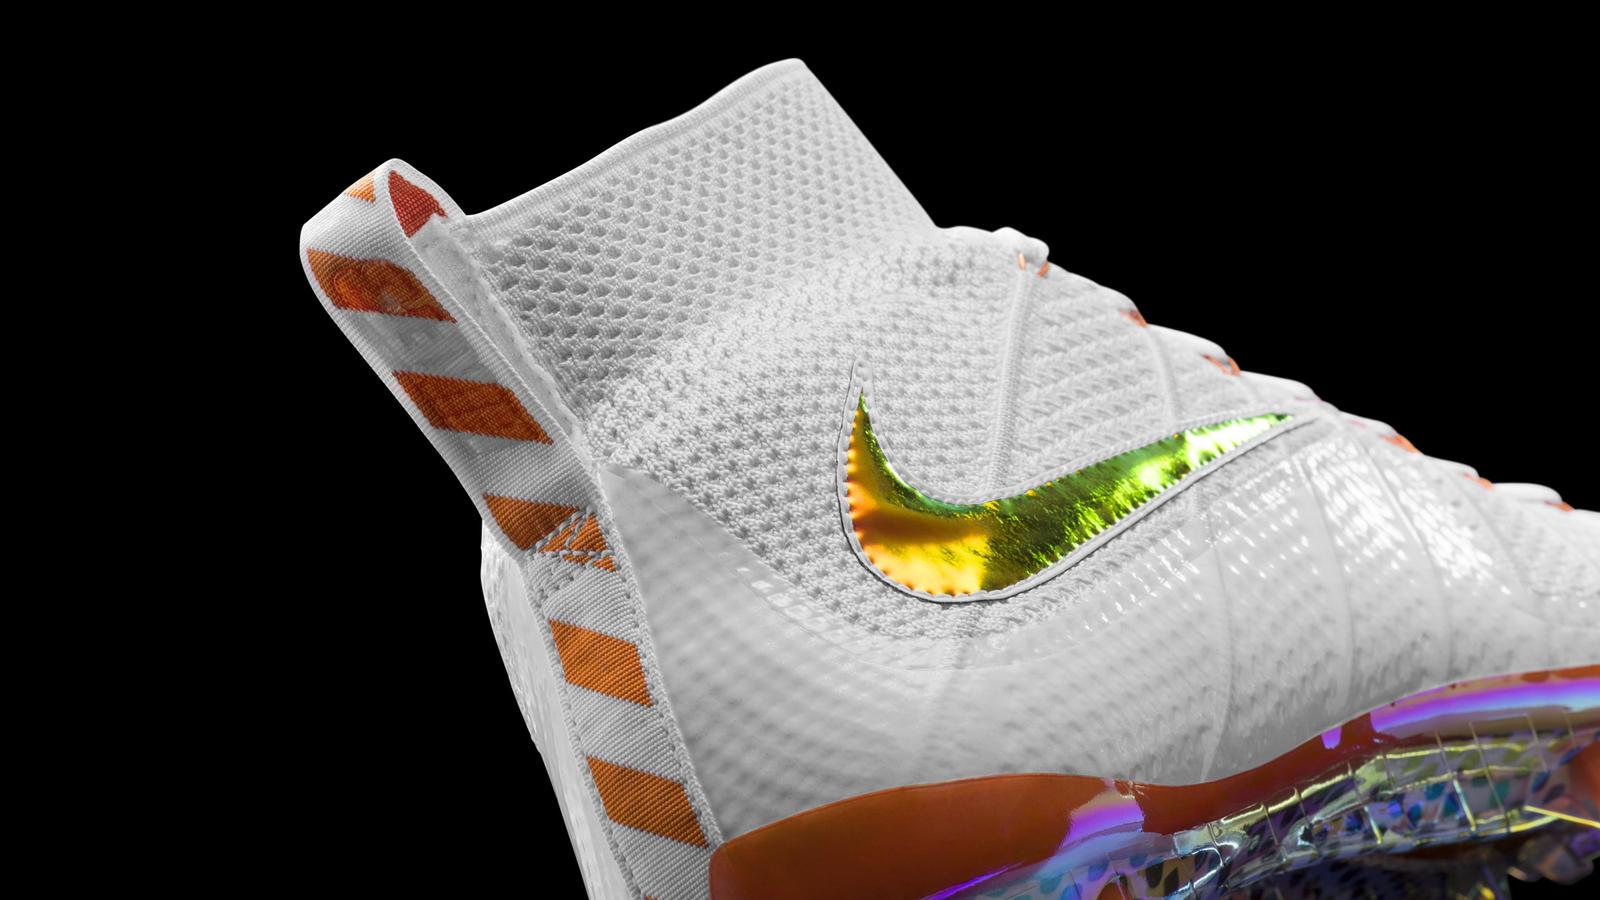 NFL NIKE SUPER BOWL XLIX COLLECTION UNVEILED - Nike News - photo#43